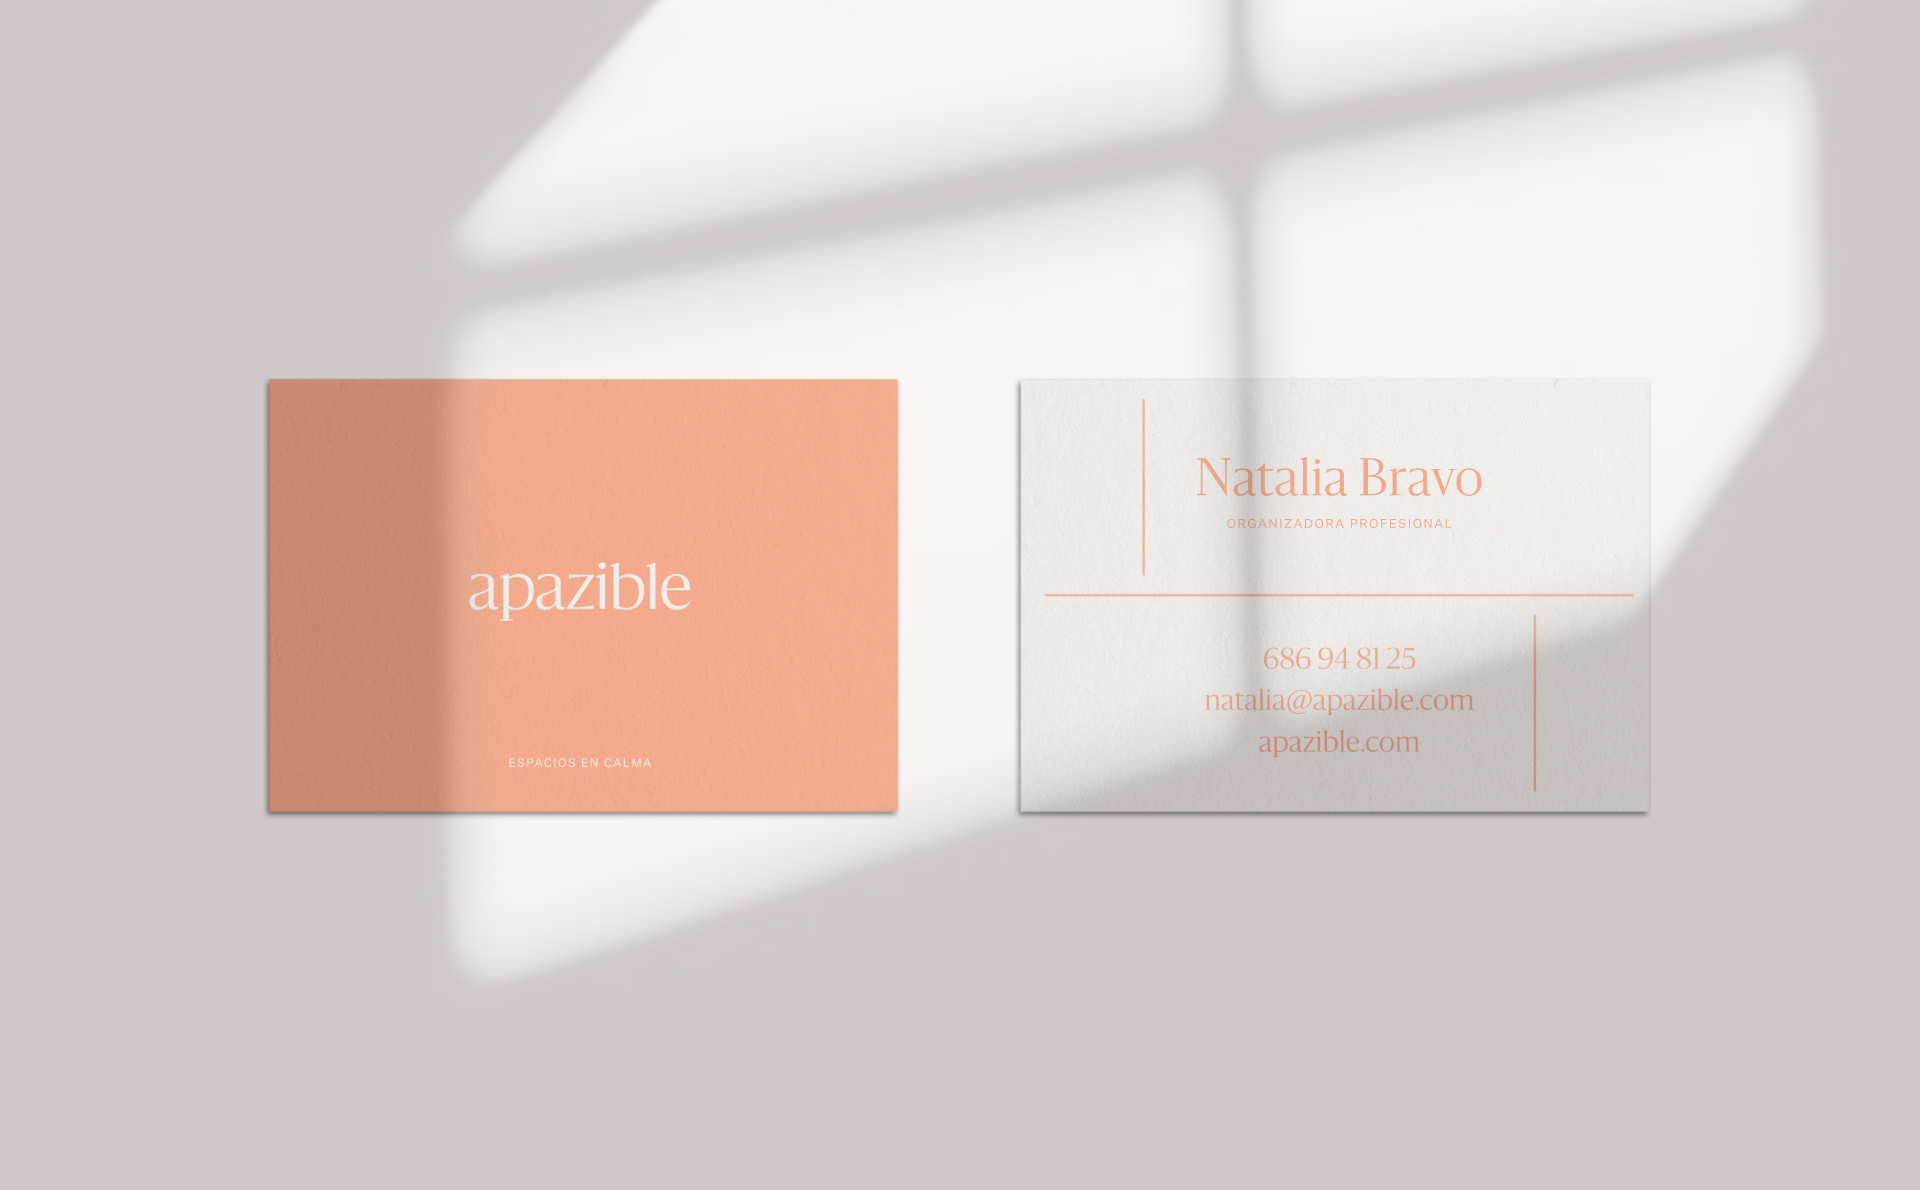 apazible_5_tarjetas3